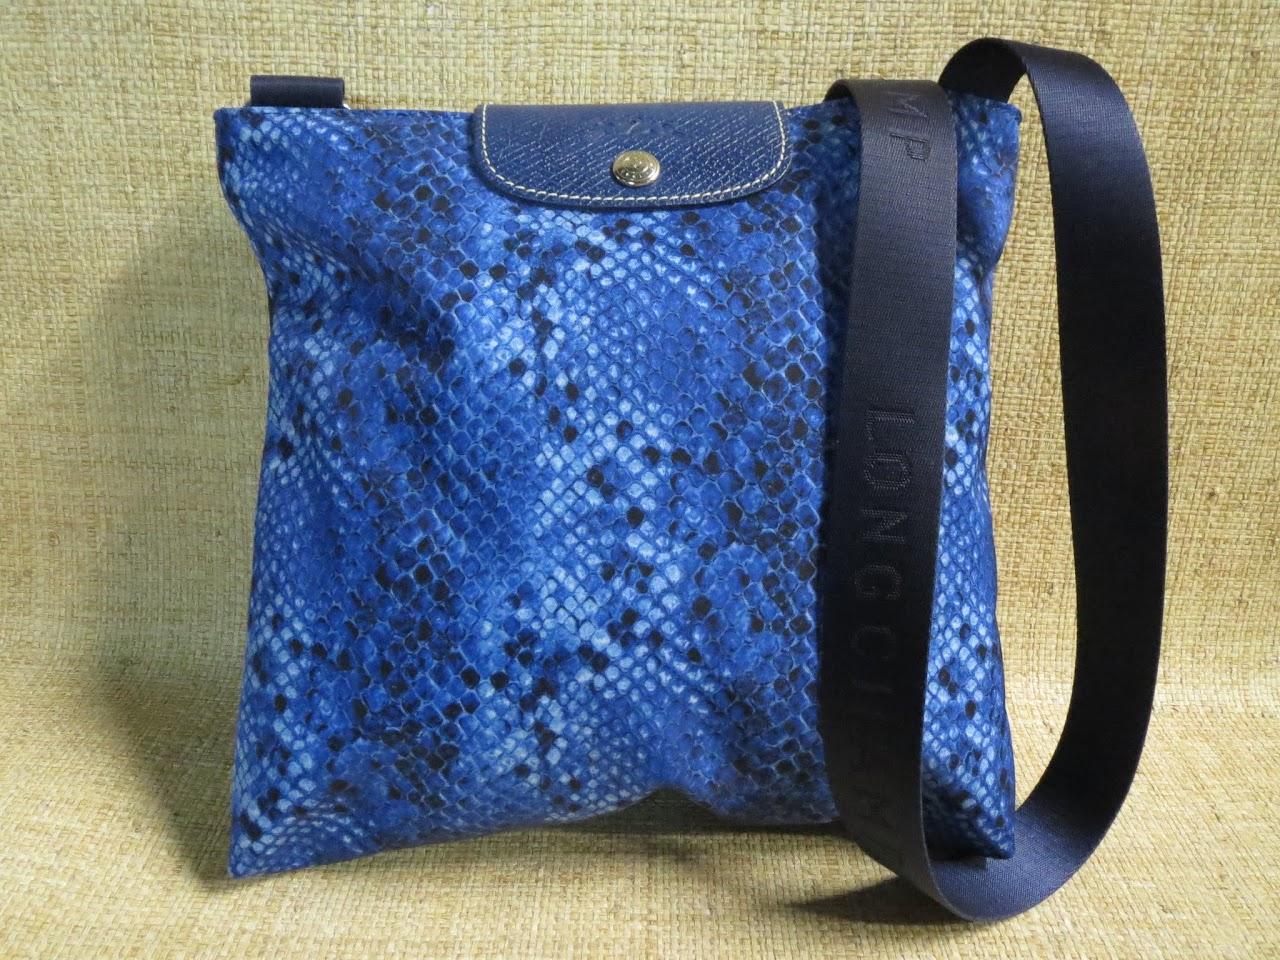 Longchamp Python-Inspired Crossbody Bag